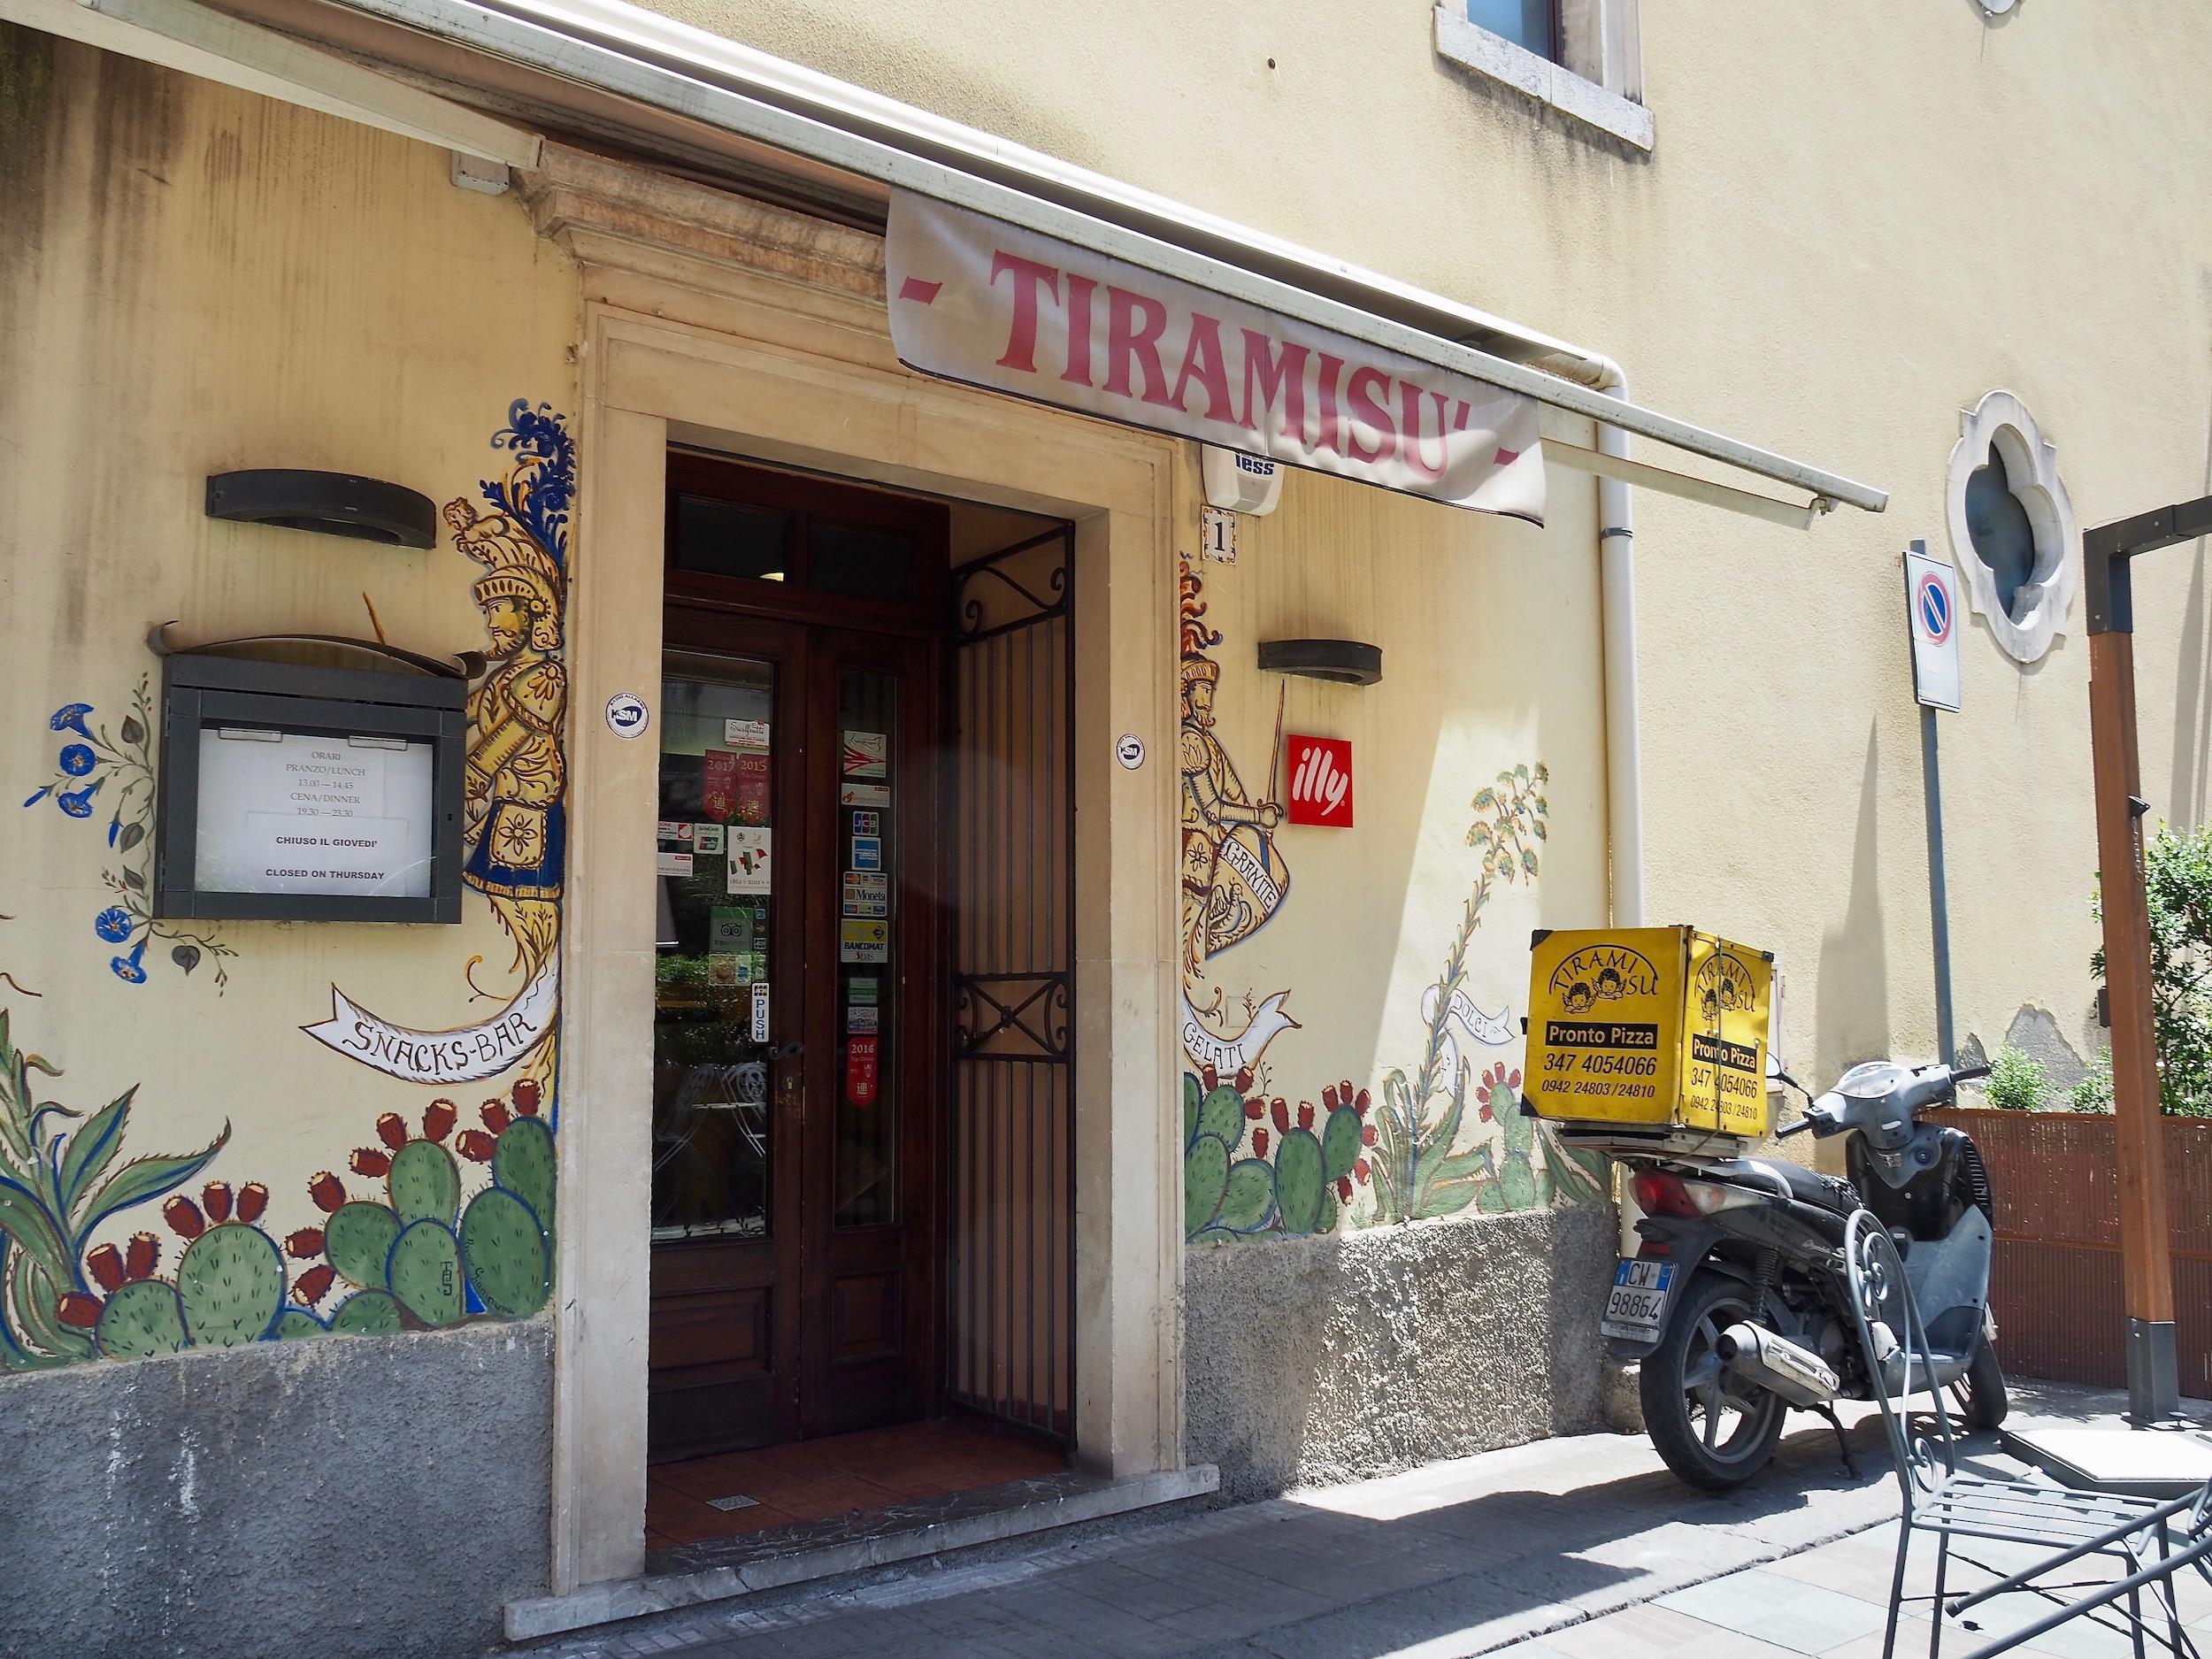 Tiramisu1.jpg